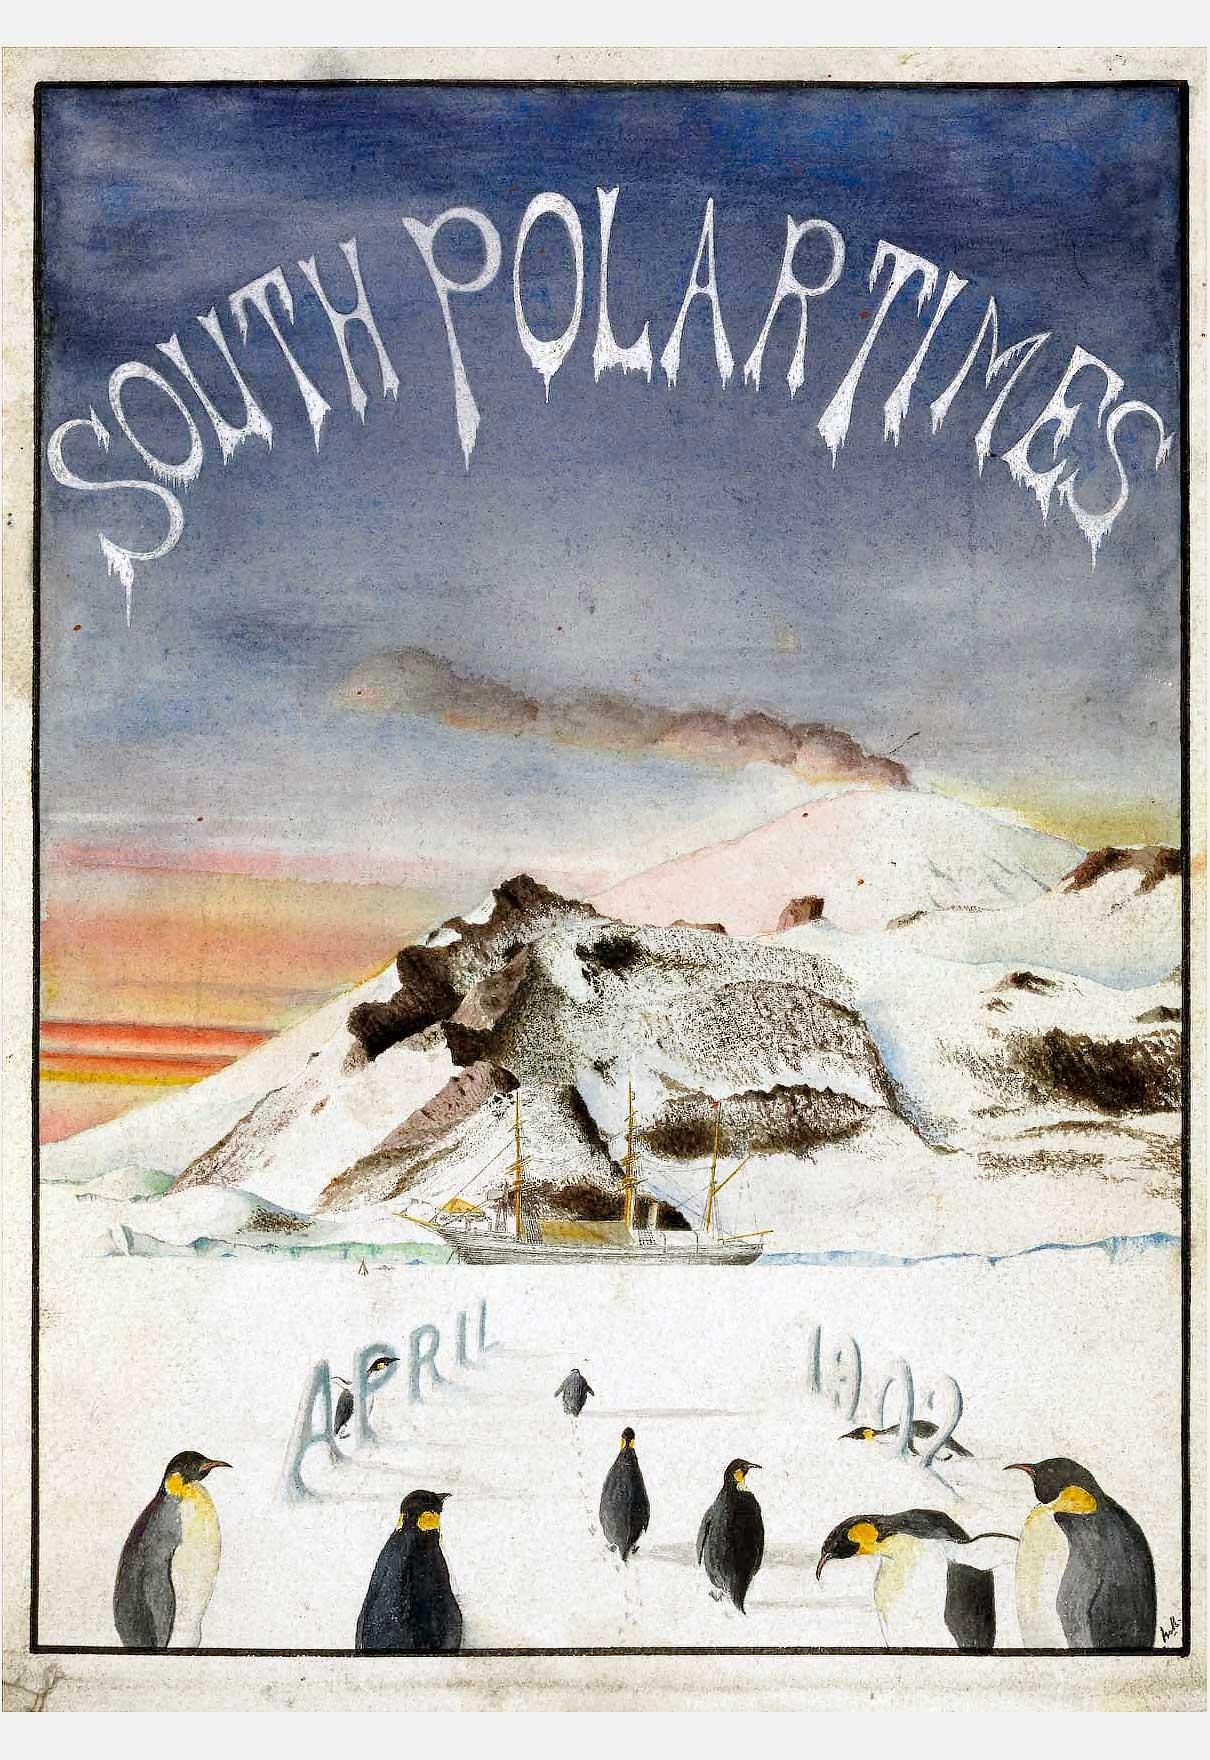 South Polar Times 1